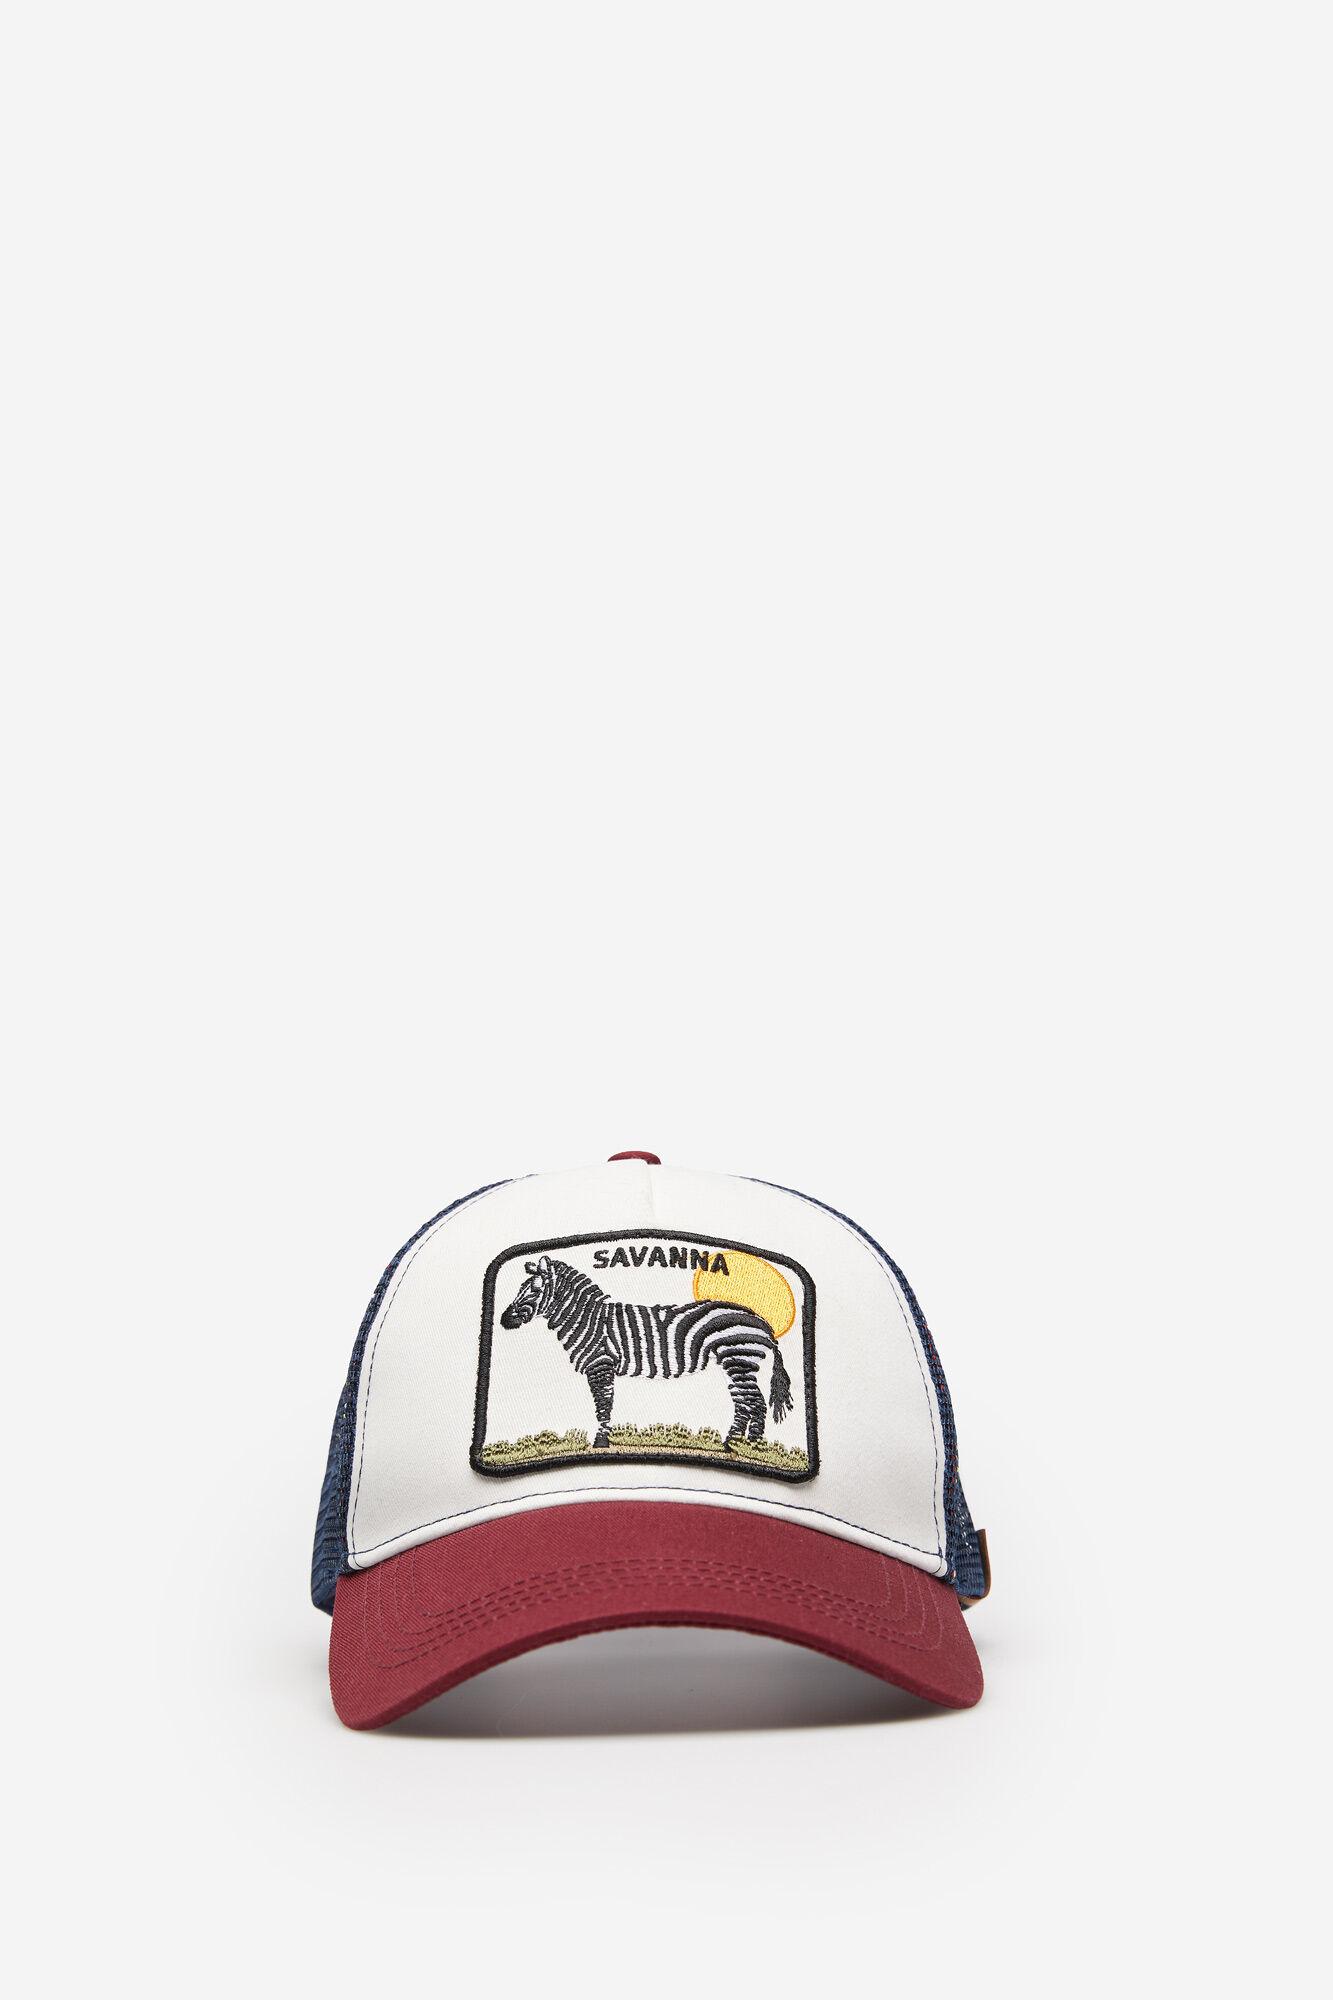 Accessoires | Springfield Homme